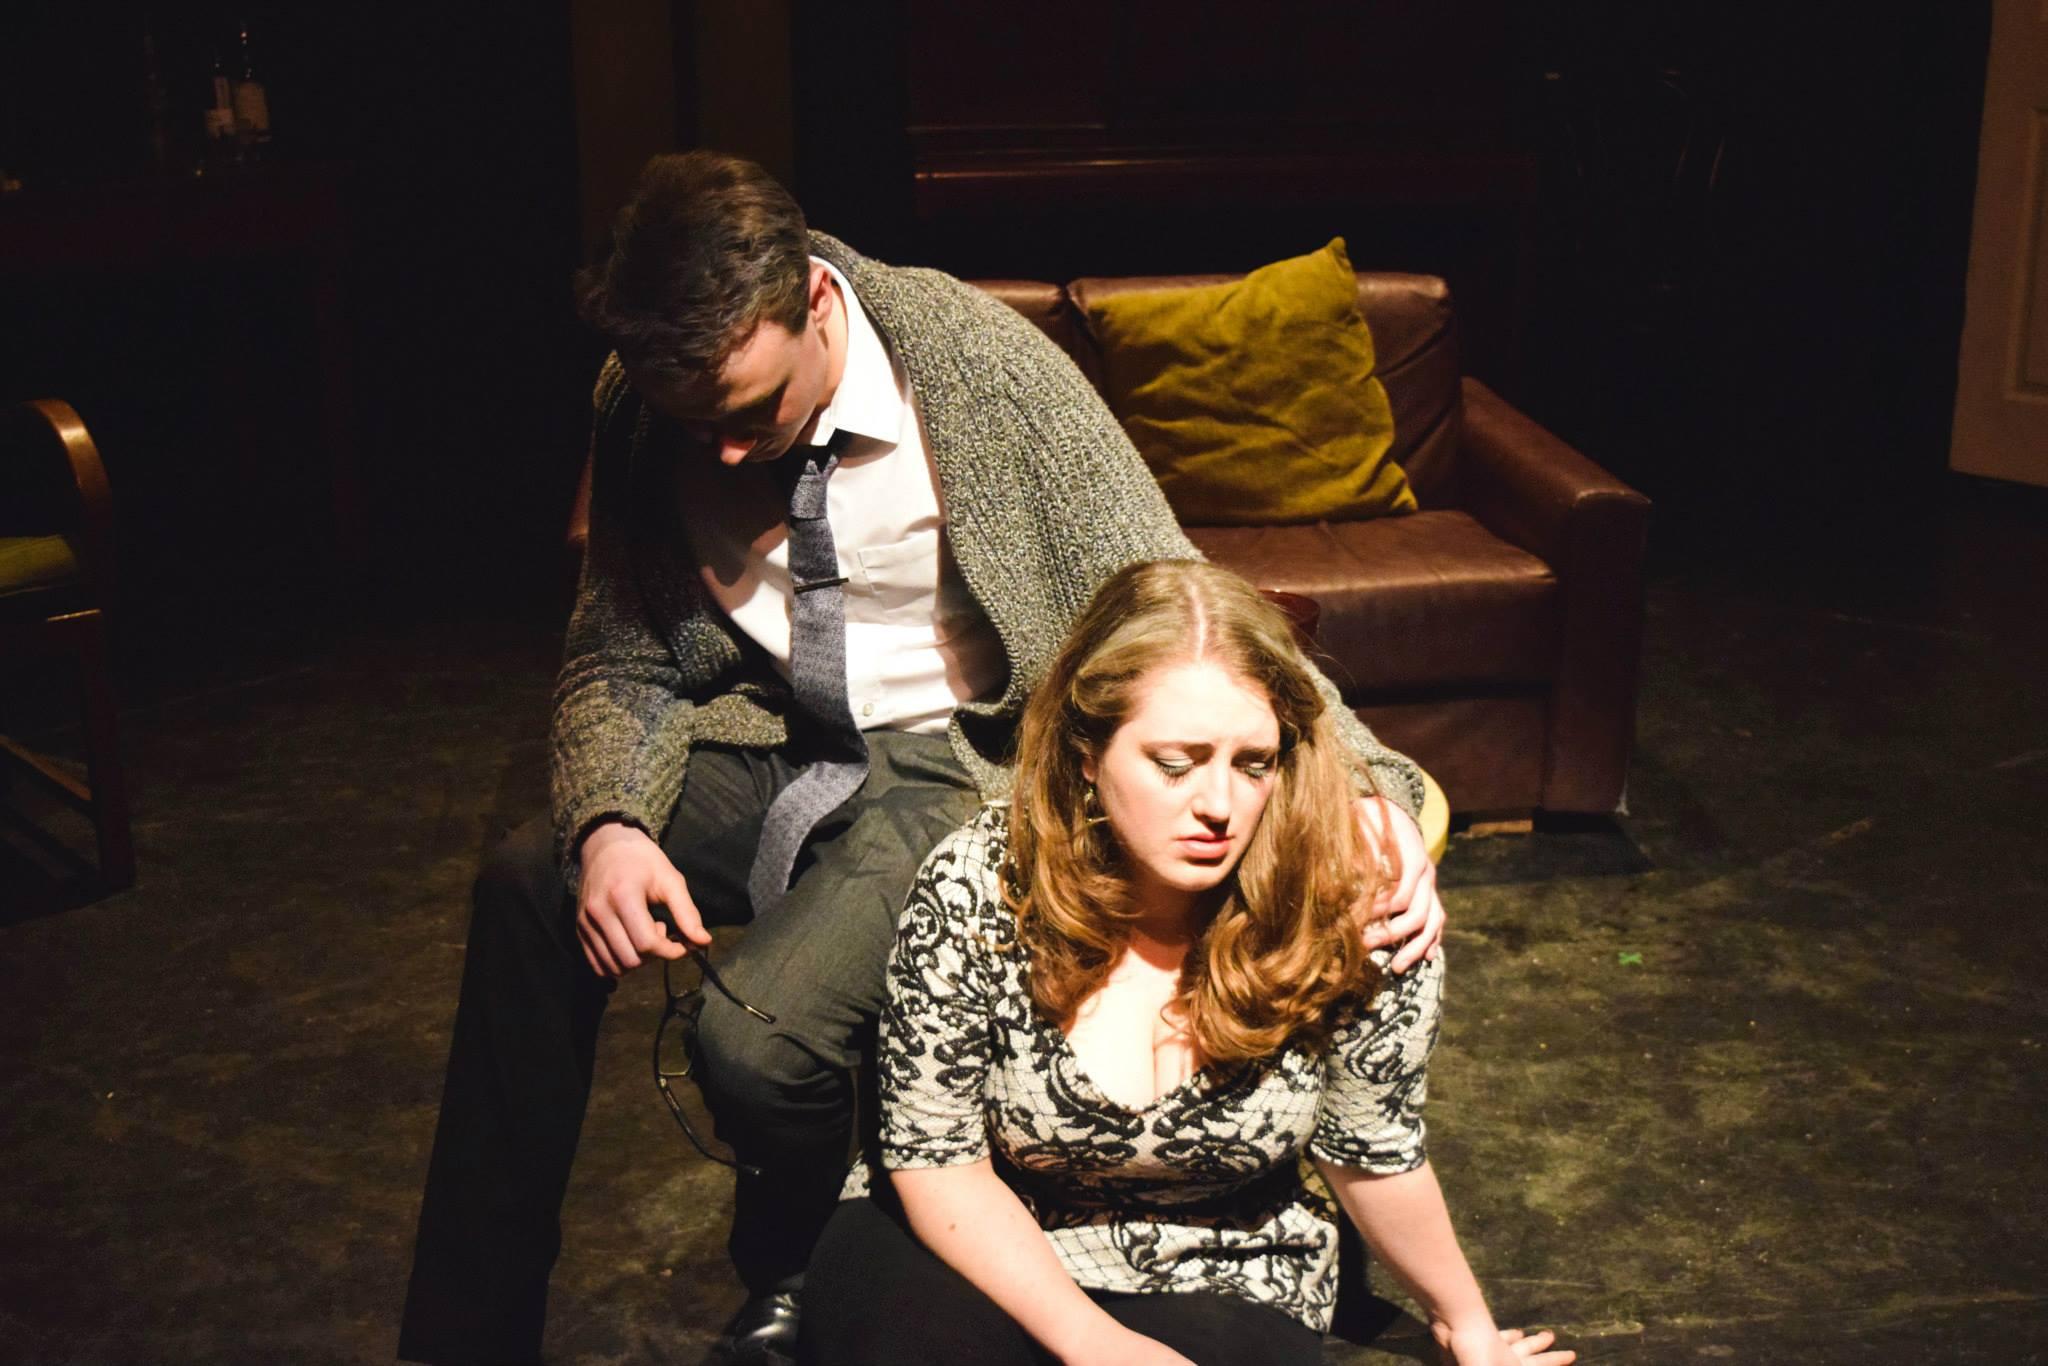 Who's Afraid of Virginia Woolf? (Edward Albee), 2014, The Barron Theatre   Image: Louis Catliff